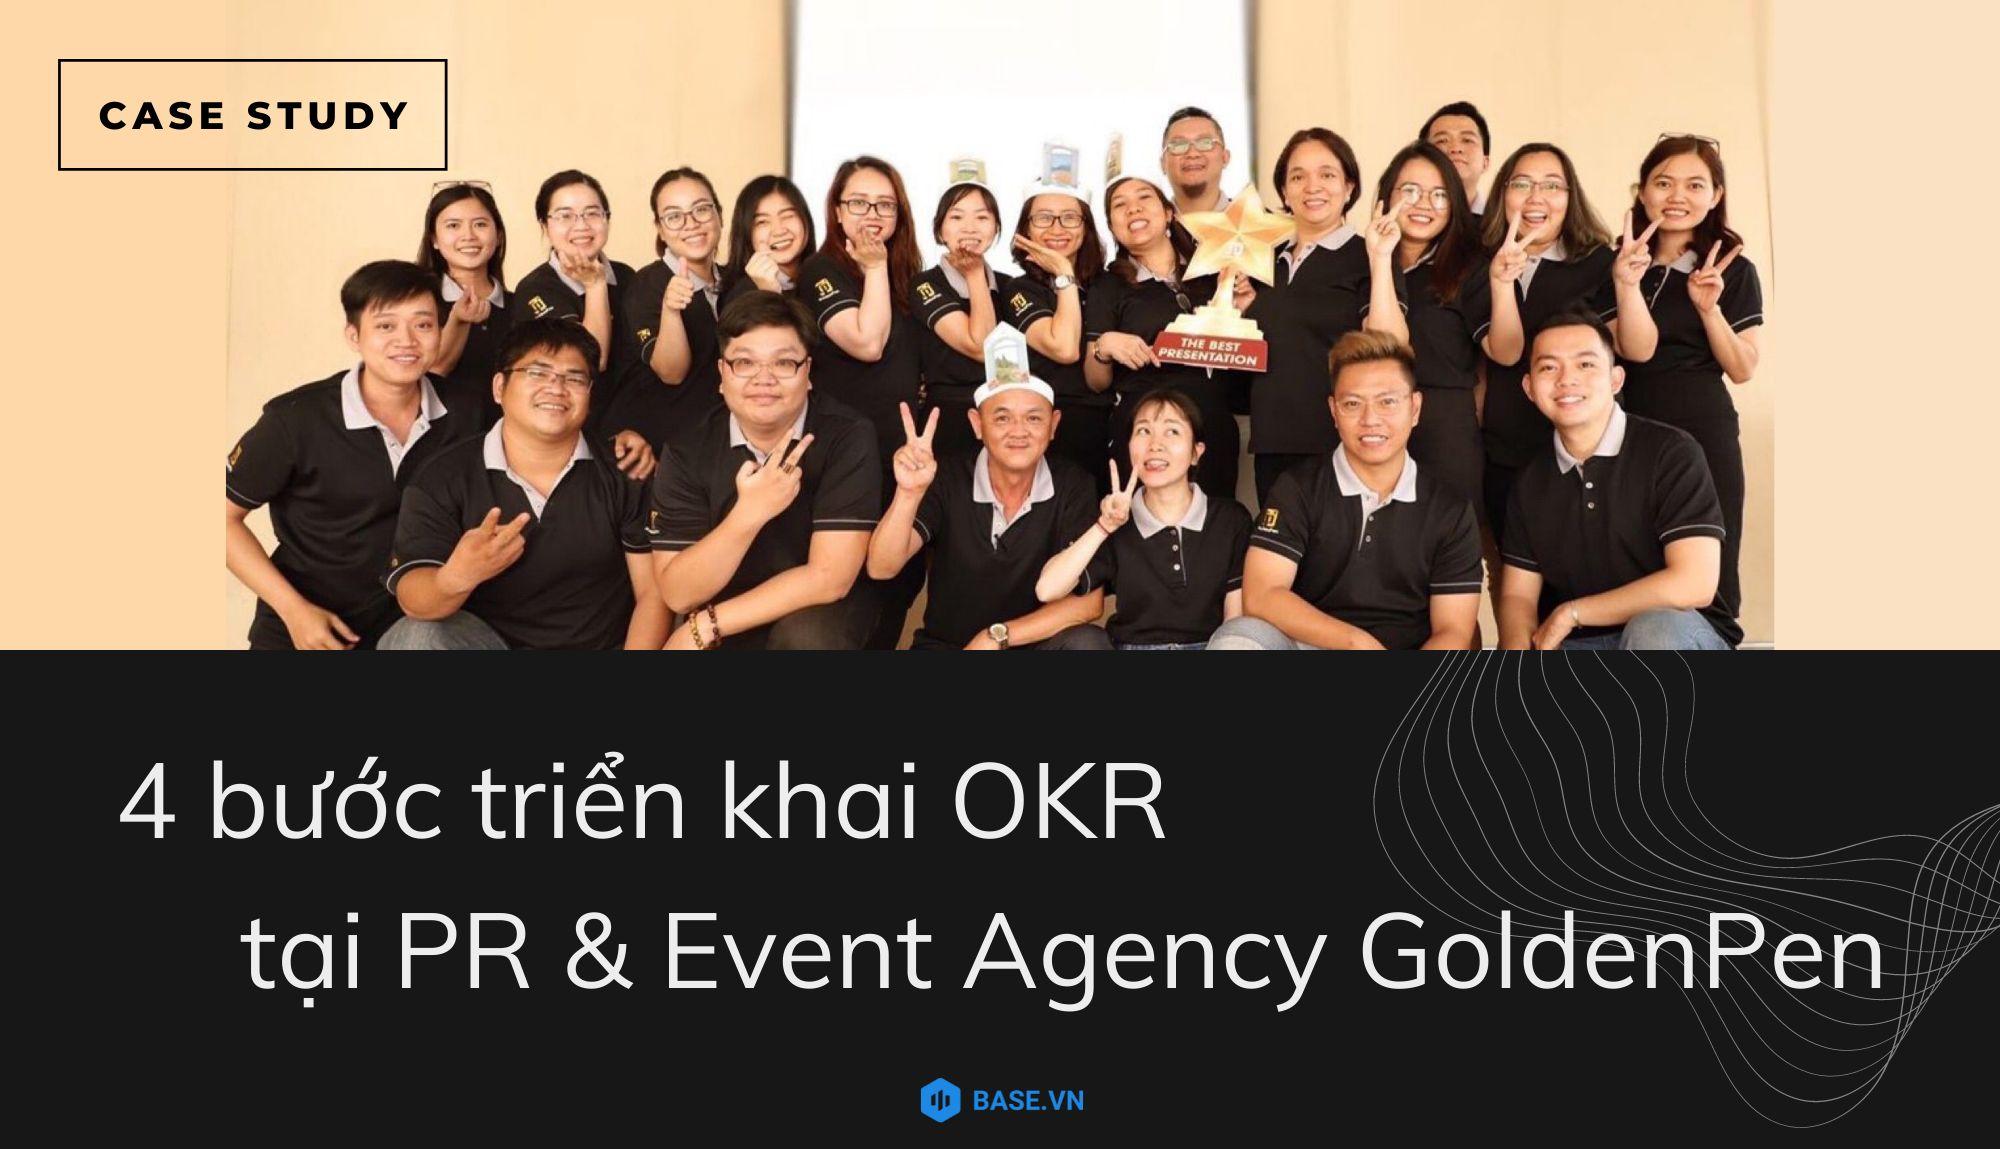 Case study: 4 bước triển khai OKR trên giải pháp Base Goal tại GoldenPen PR&Event Agency